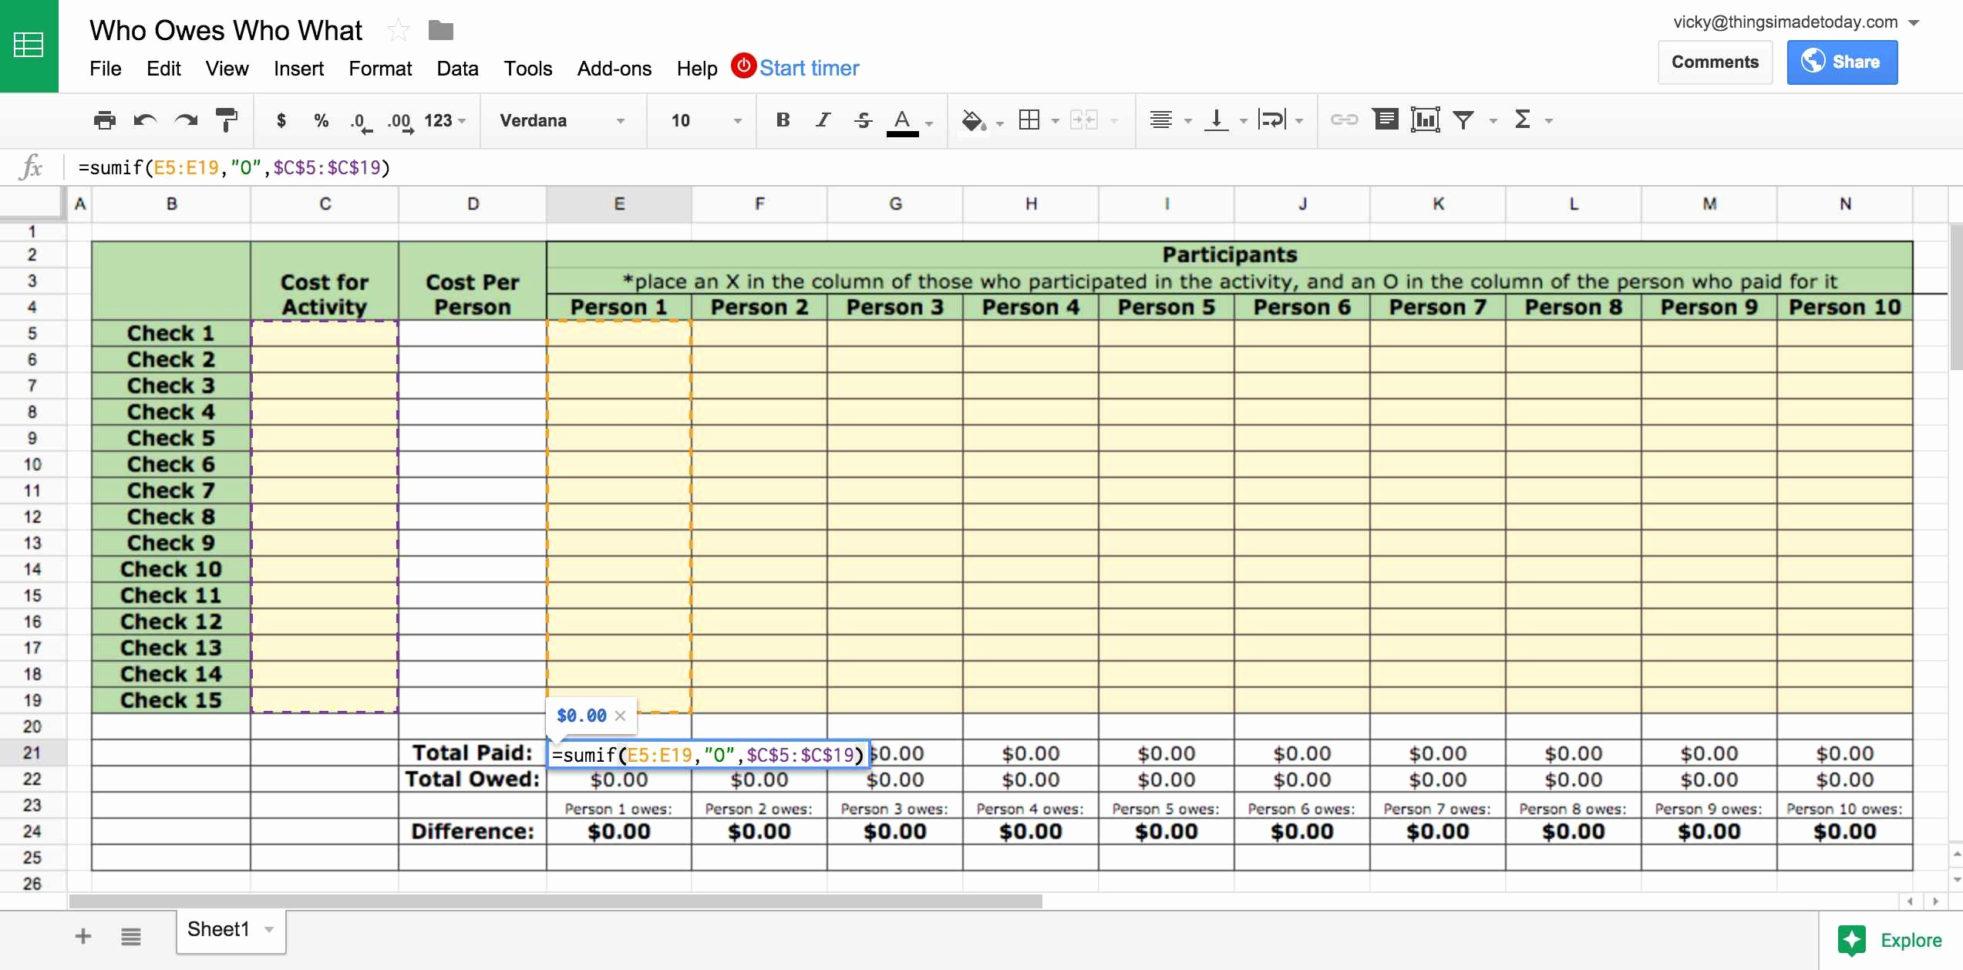 Product Pricing Spreadsheet Regarding Product Pricing Spreadsheet  Aljererlotgd